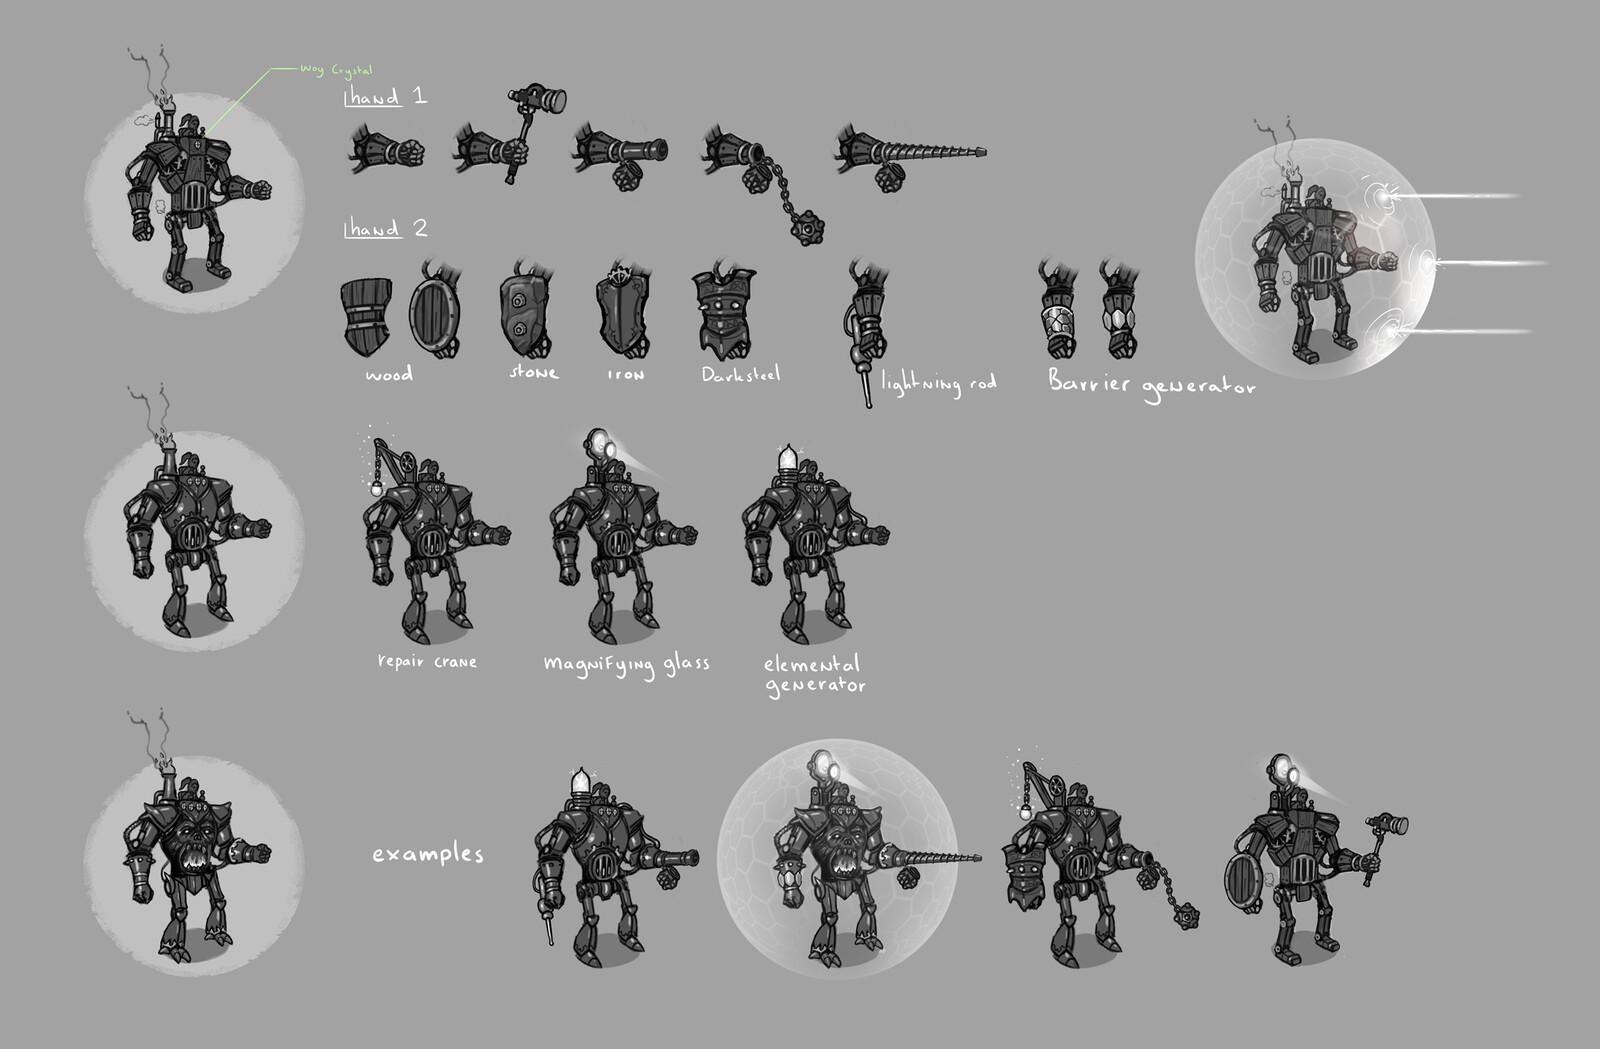 Mecha upgrade concepts